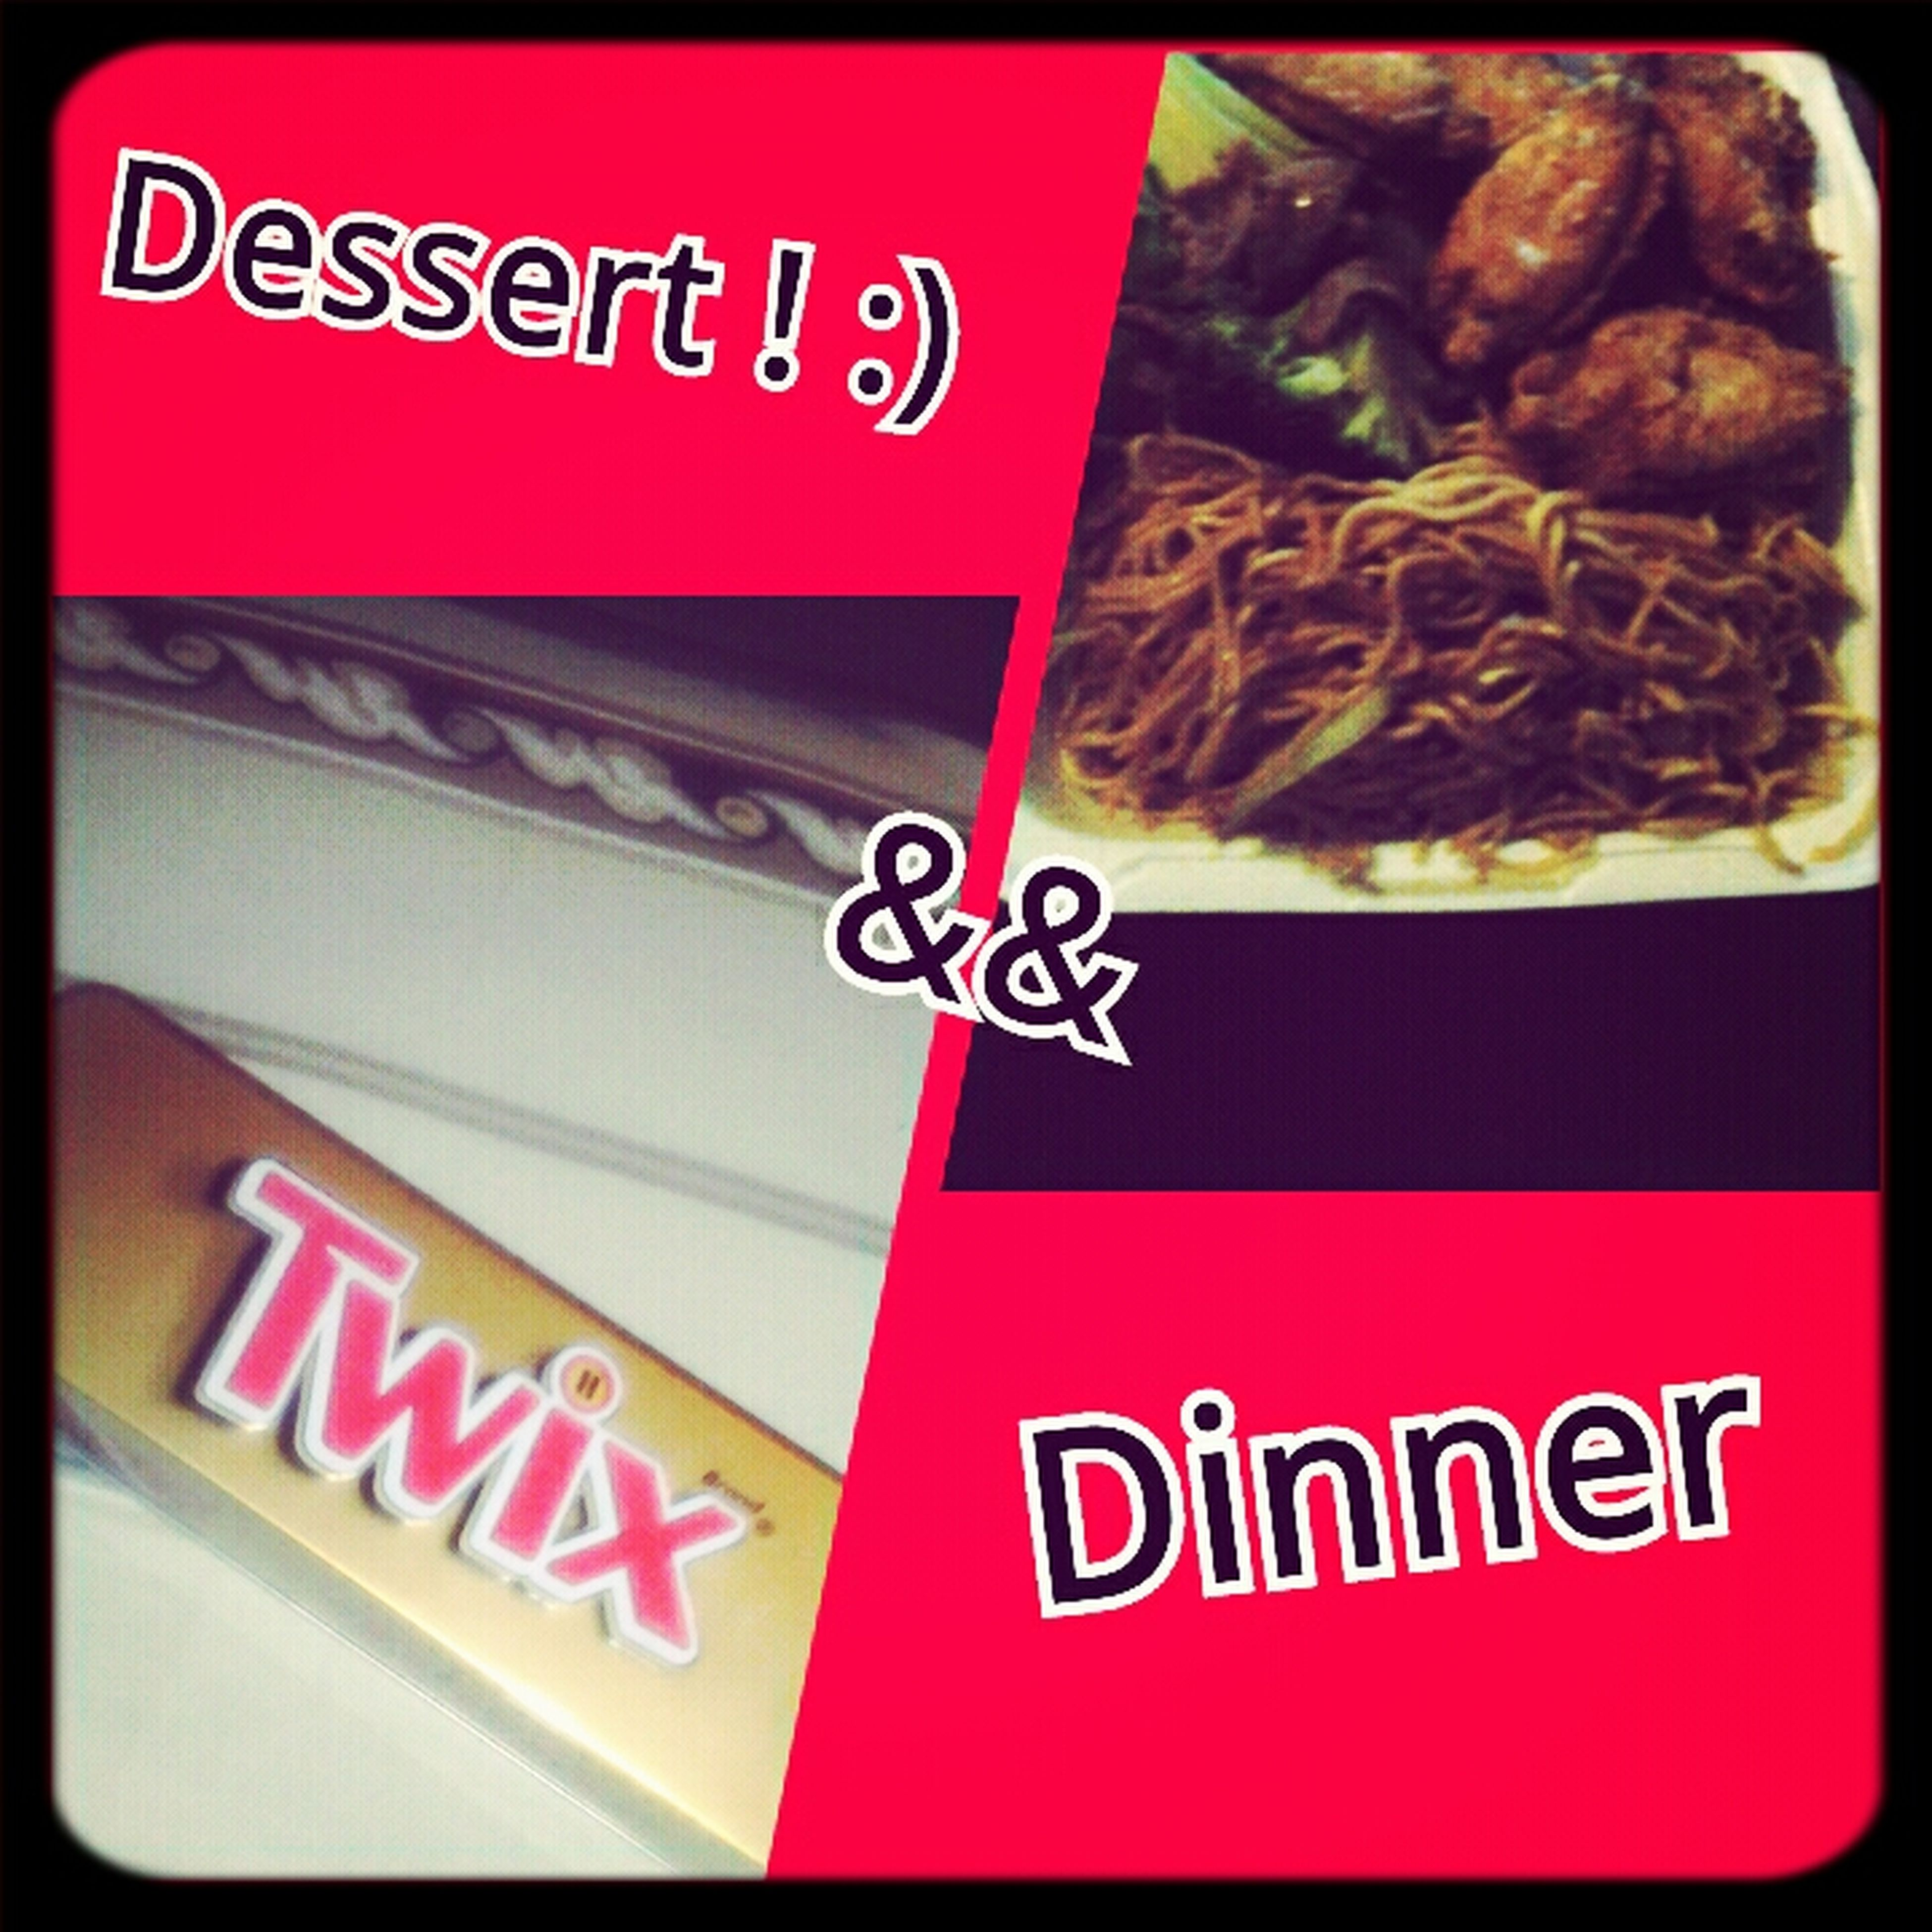 Dessert And Dinner My Favs ! :)